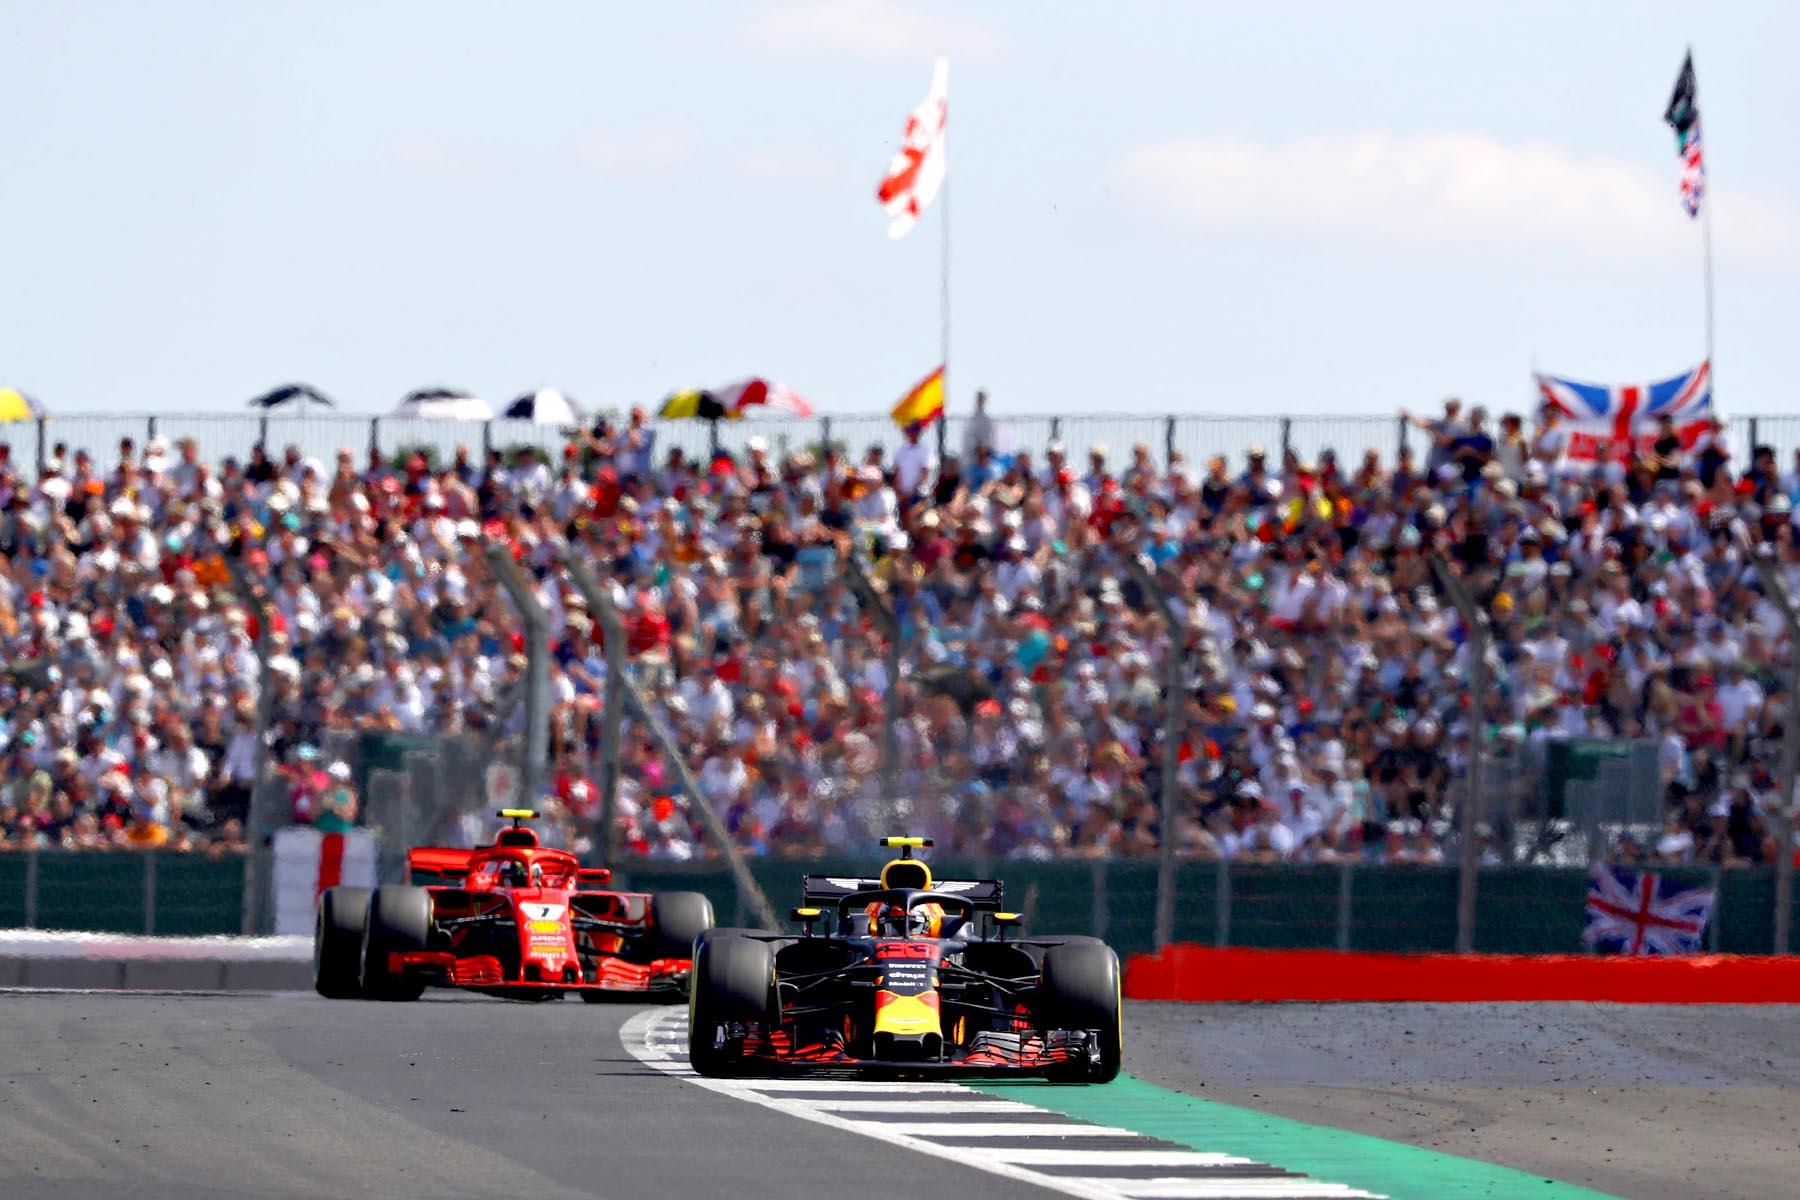 Max Verstappen and Kimi Raikkonen on track at the 2018 British Grand Prix.